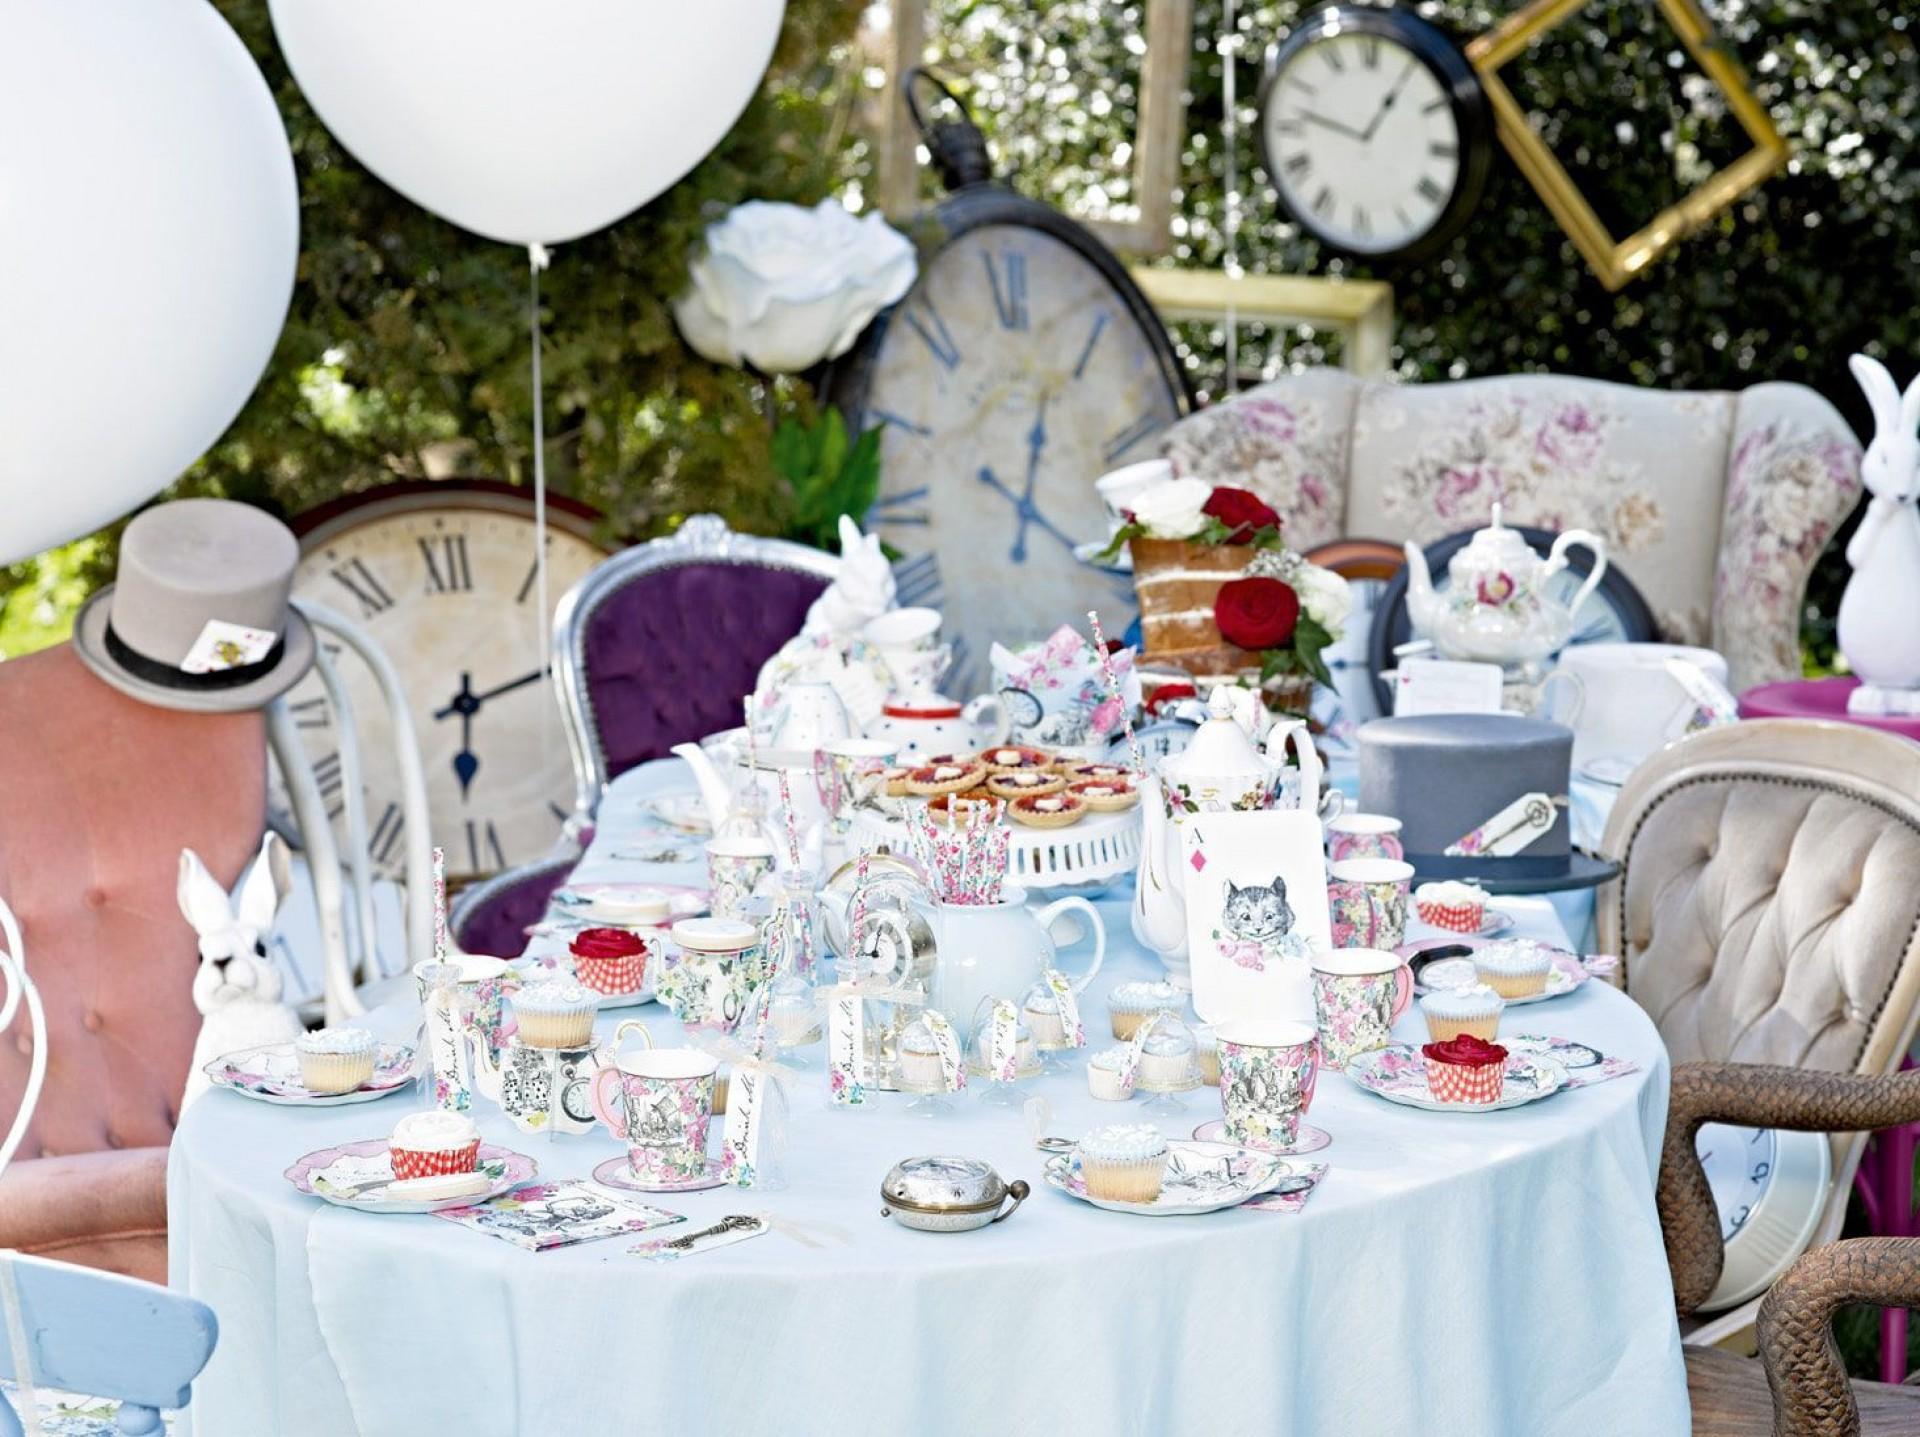 009 Stunning Alice In Wonderland Tea Party Template Highest Clarity  Templates Invitation Free1920